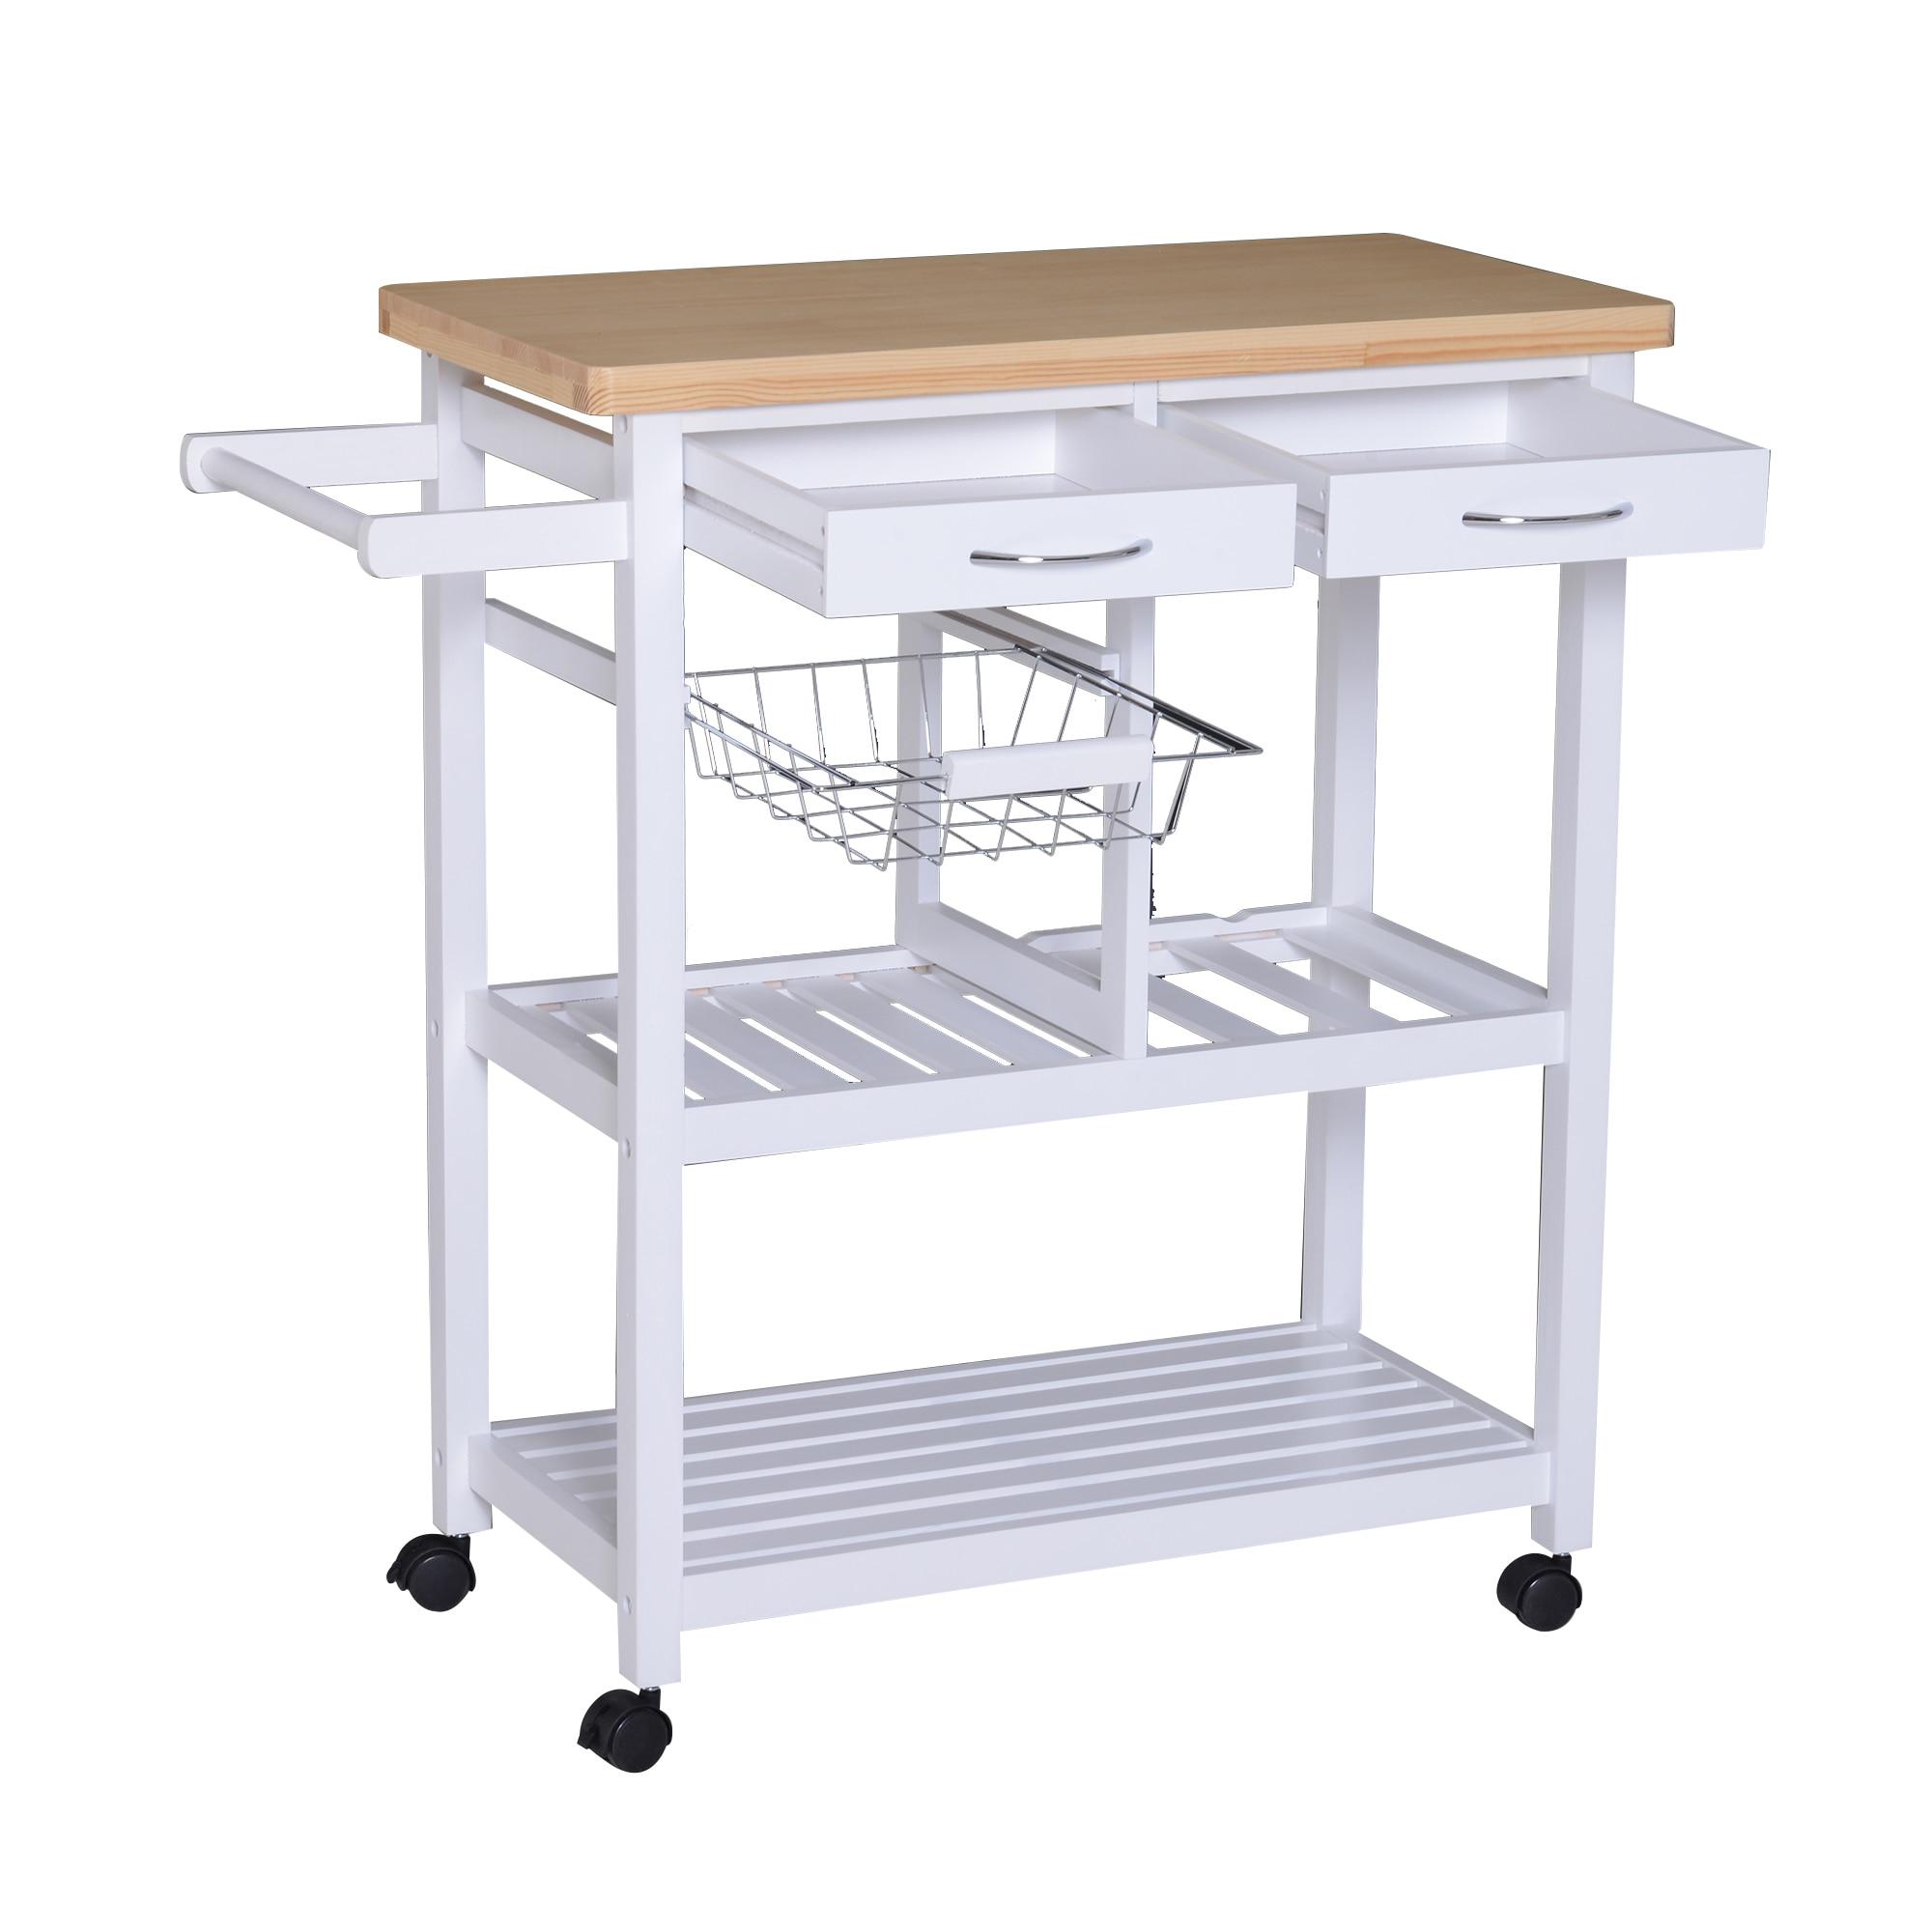 HOMCOM Cart Scope With Bottle Holder And 2 Basket Shelves, 2 Drawers Durable Versatile Kitchen Pine Wood